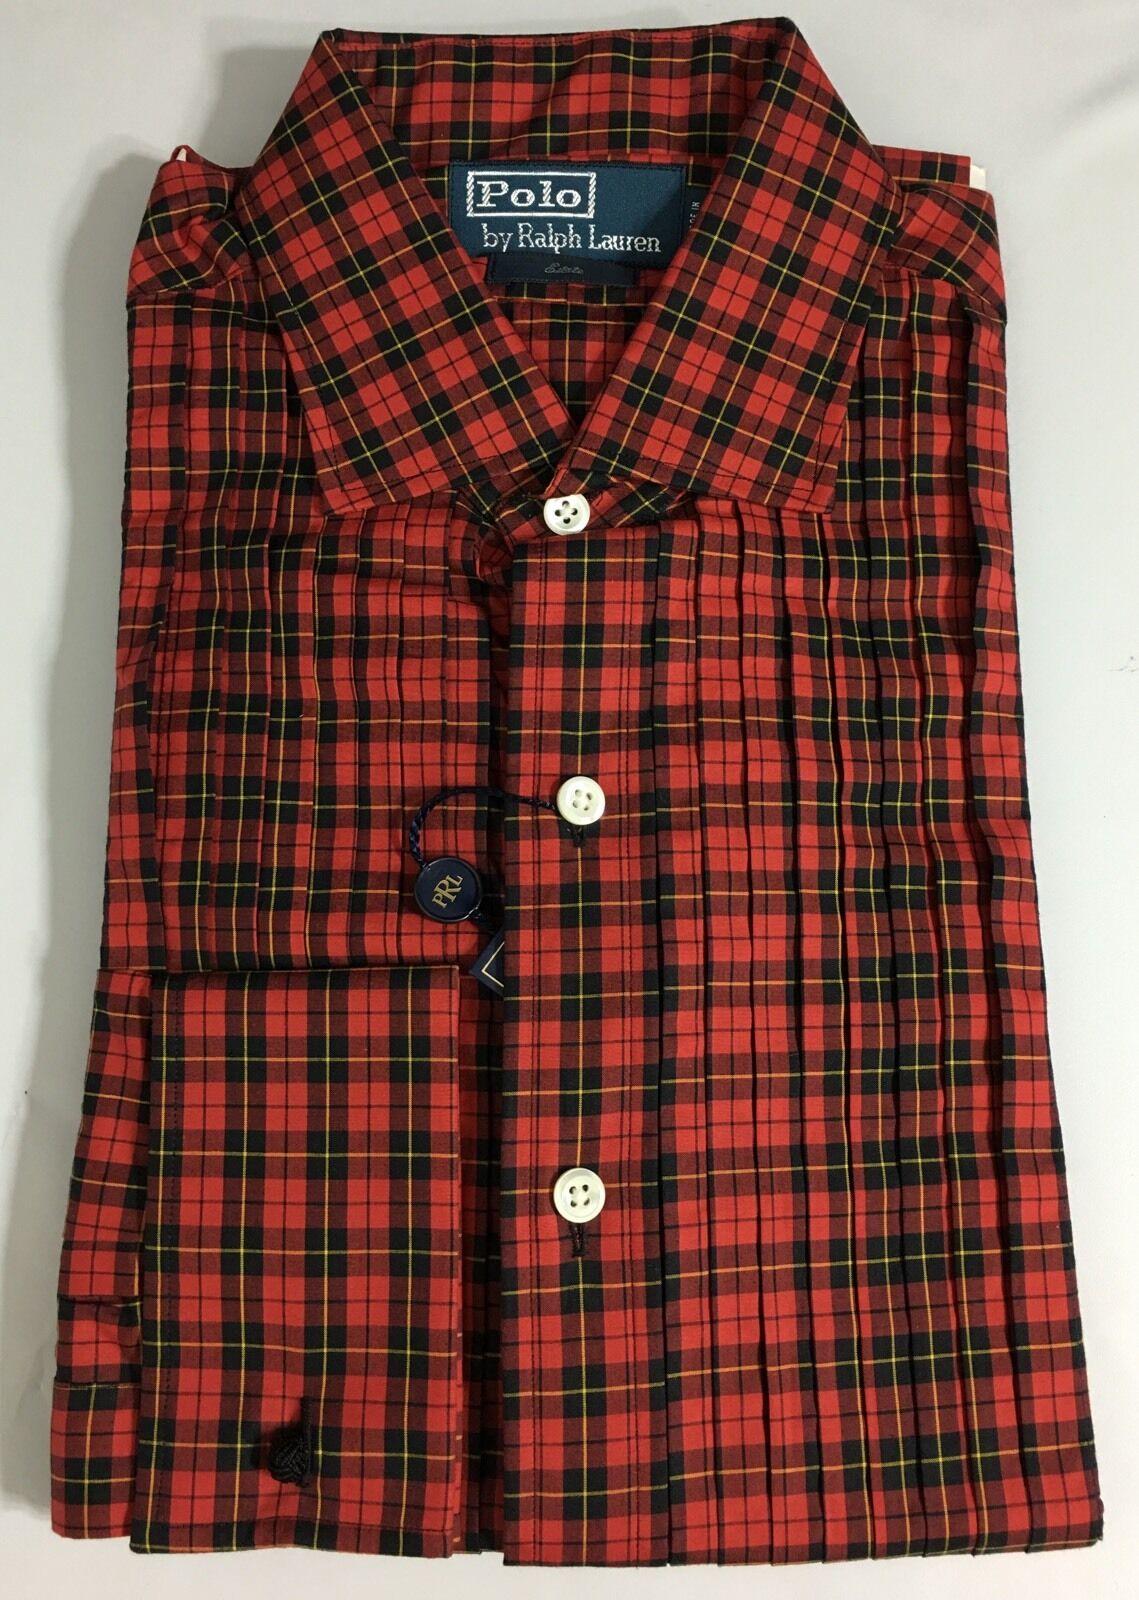 Polo Ralph Lauren Tuxedo Dress Shirt Mens 16 40 41 Red Glen Plaid Estate